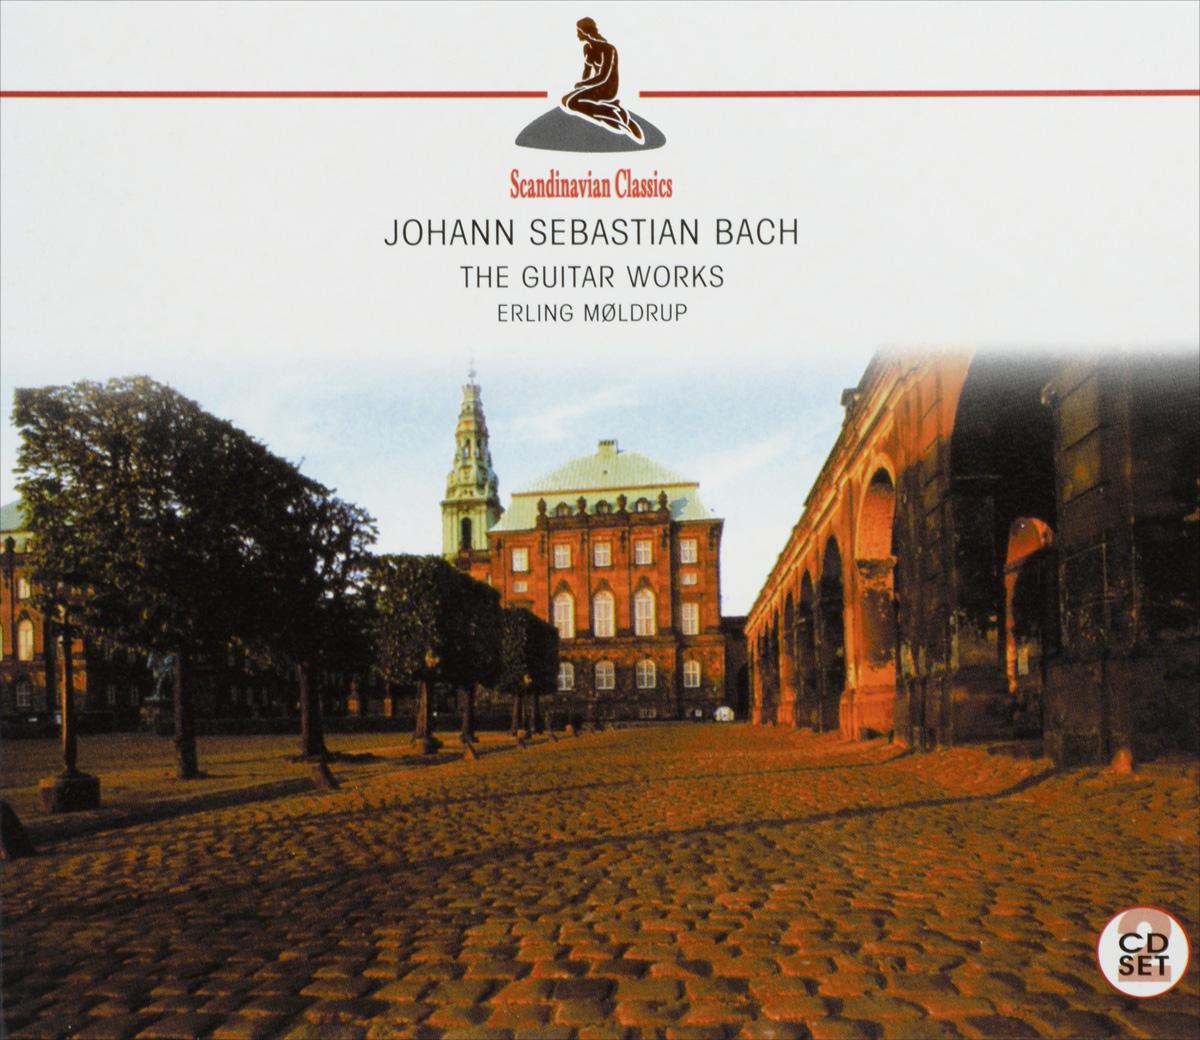 лучшая цена Erling Moldrup Scandinavian Classics. Erling Moldrup. Bach. The Guitar Works (2 CD)